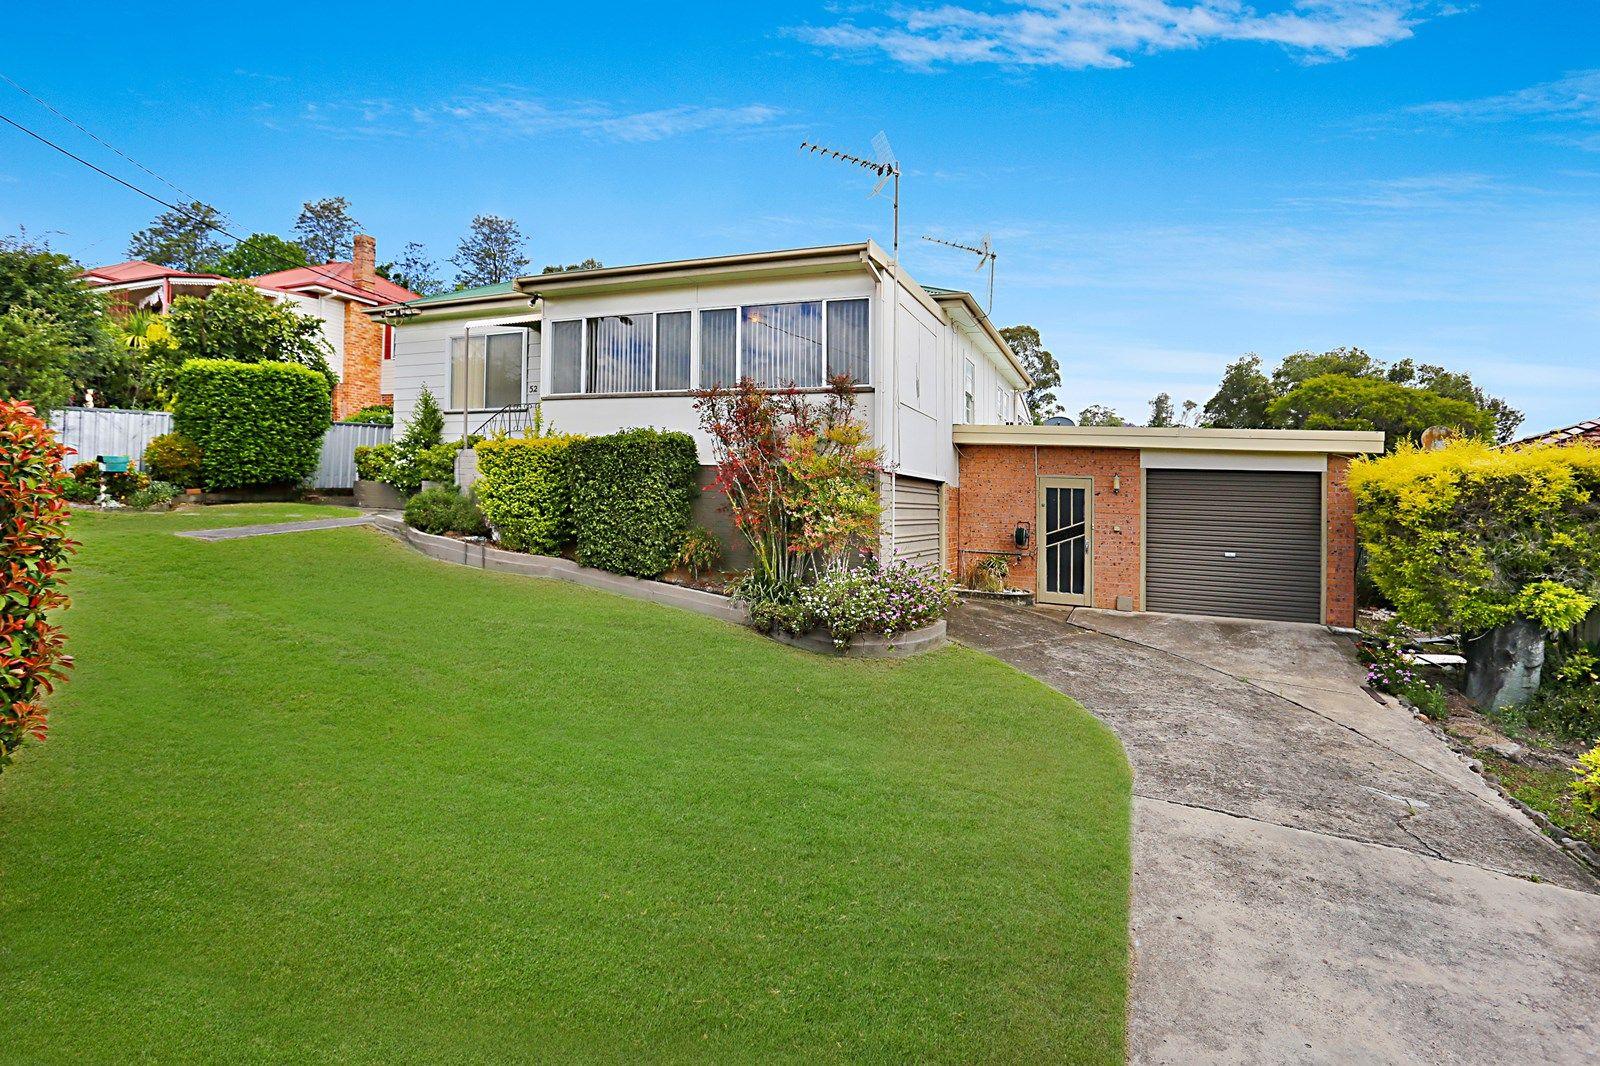 52 Myles Street, Dungog NSW 2420, Image 1